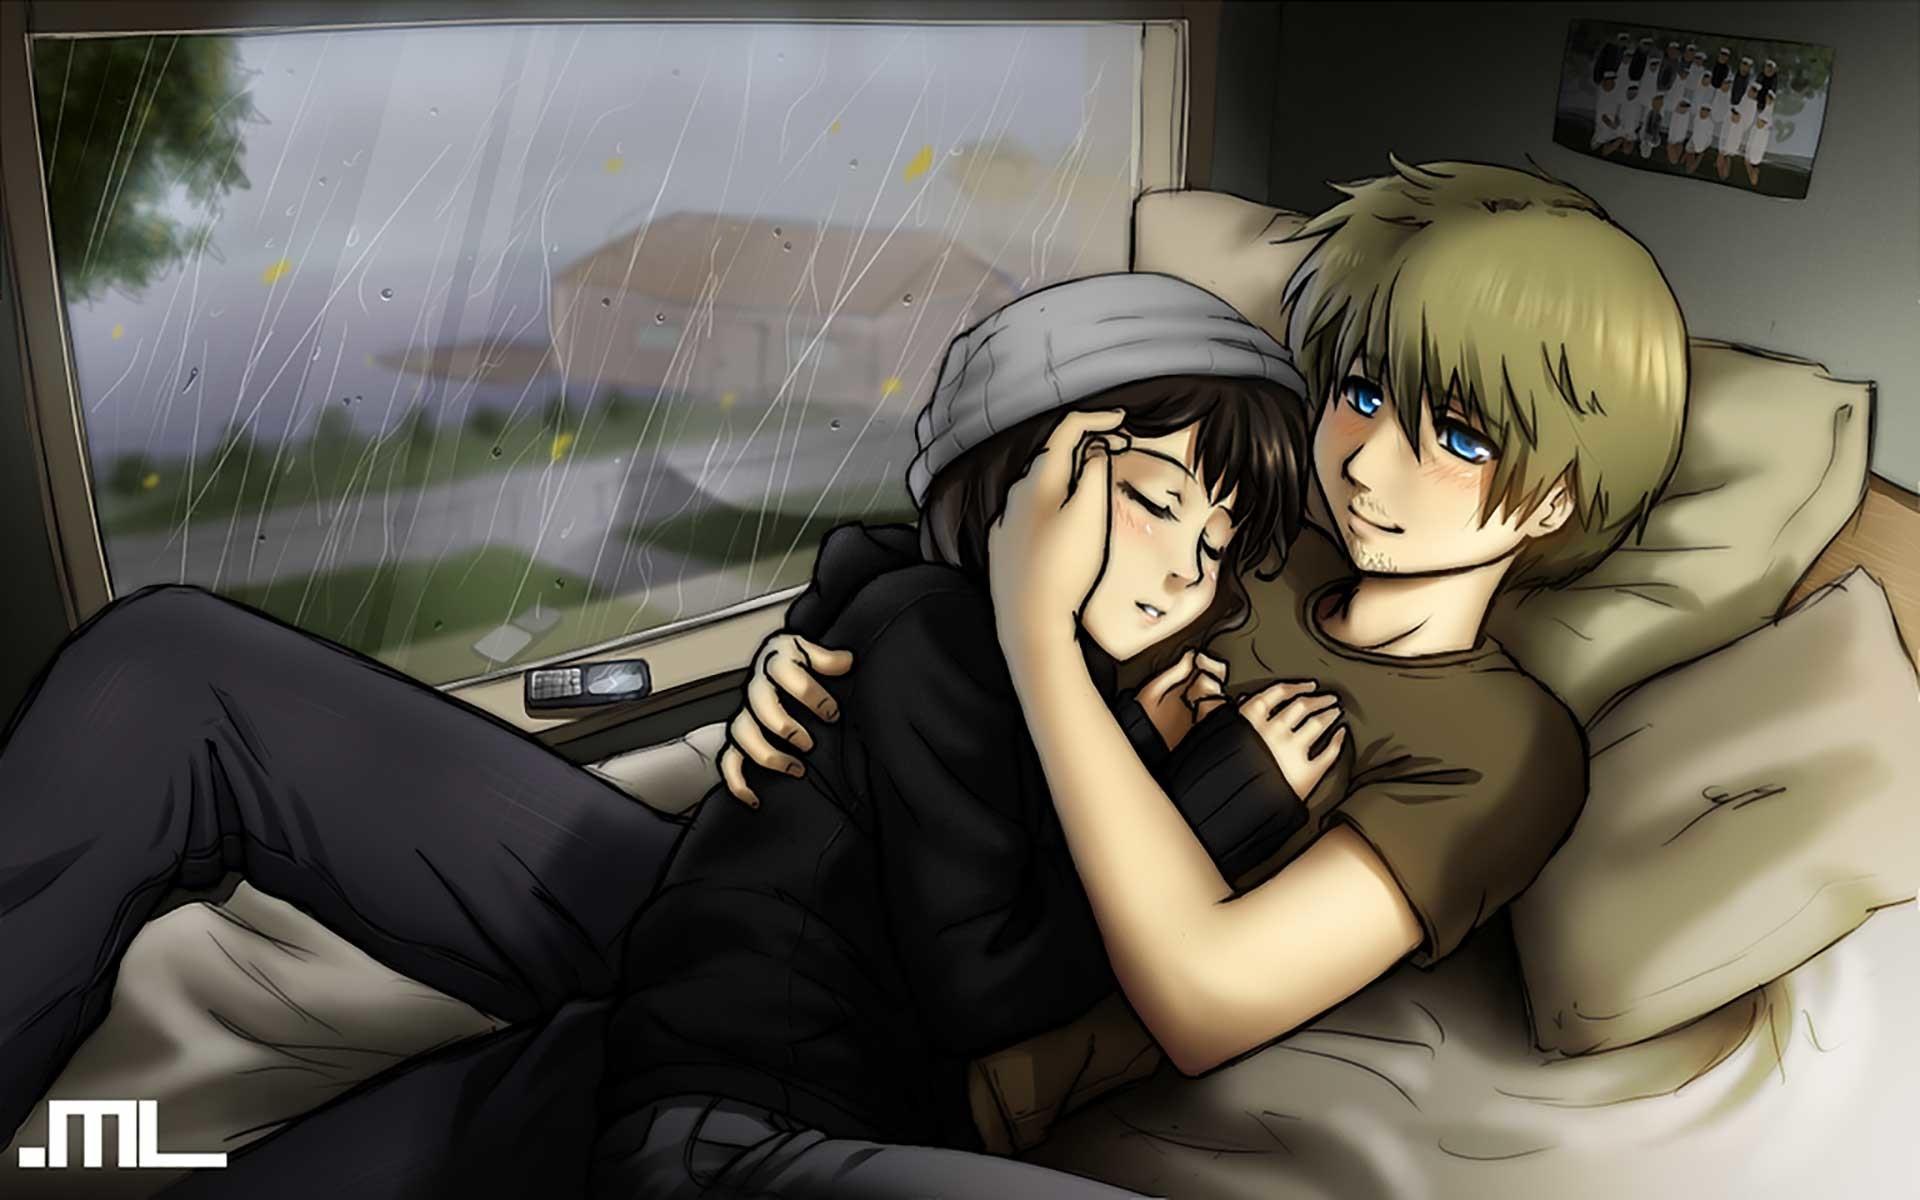 Cute Couple Hug Wallpaper For Mobile Cute Anime Couple Wallpaper 70 Images